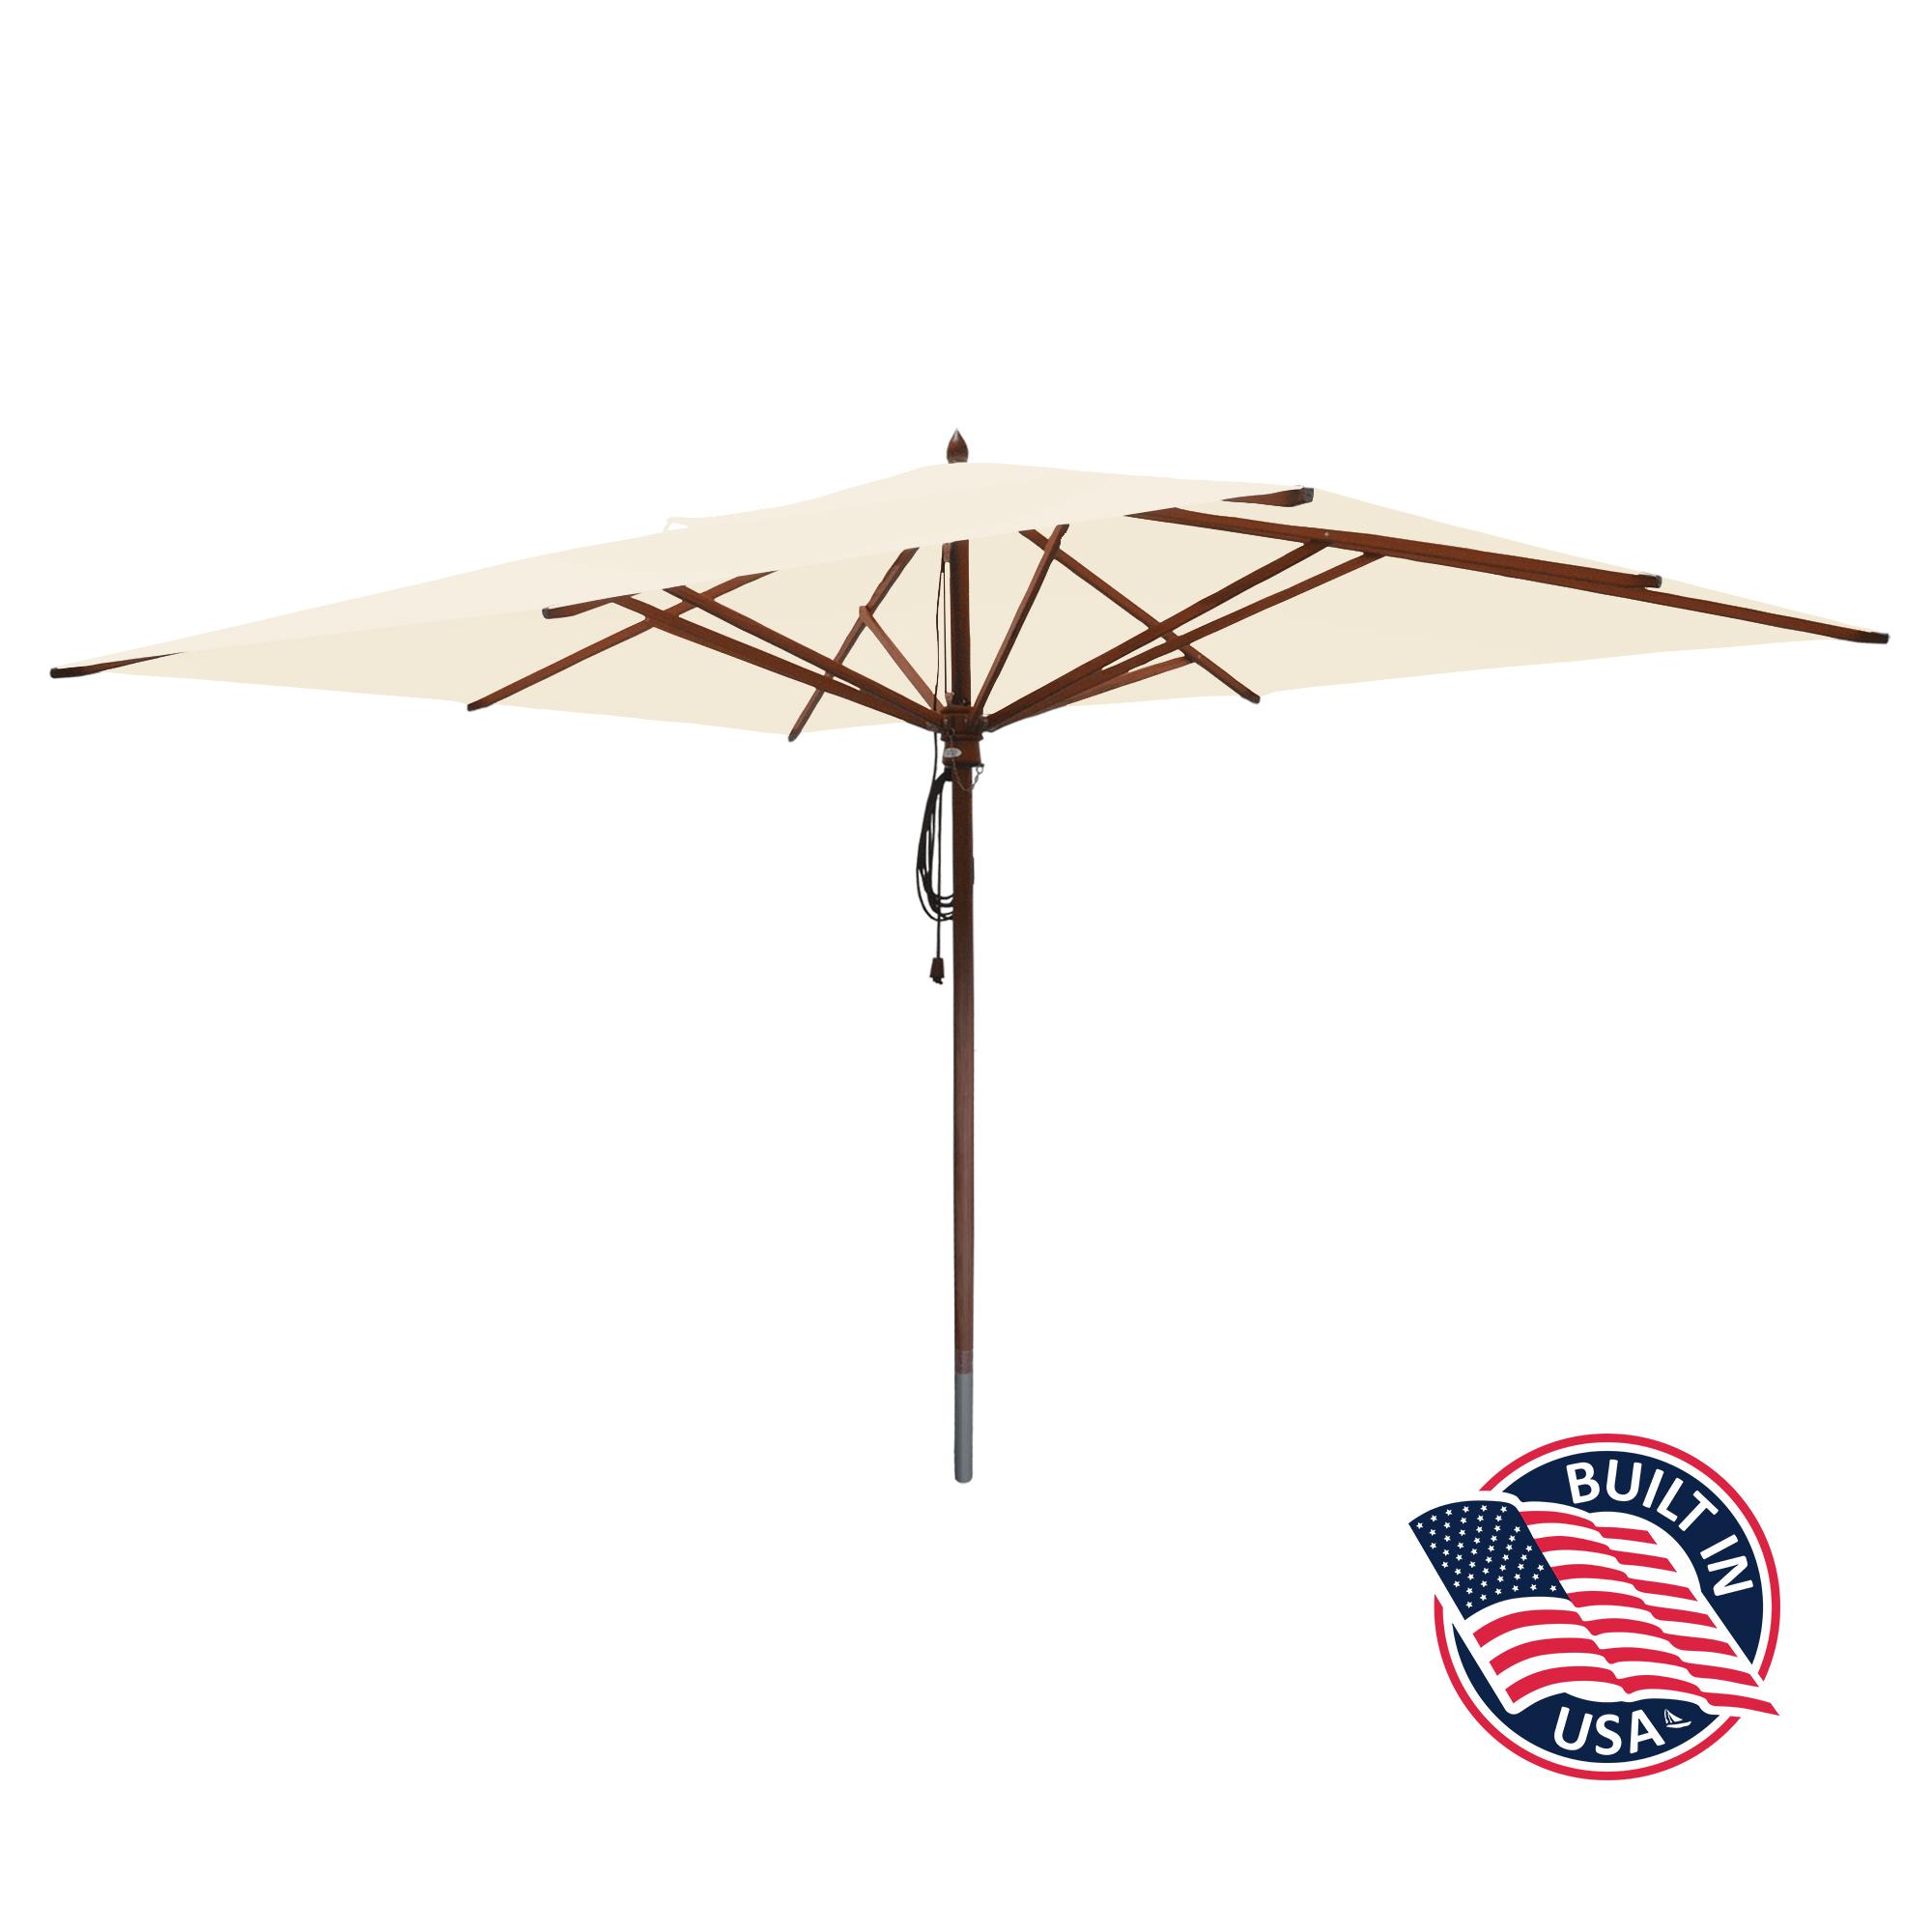 10' x 13' Rectangle Patio Umbrella